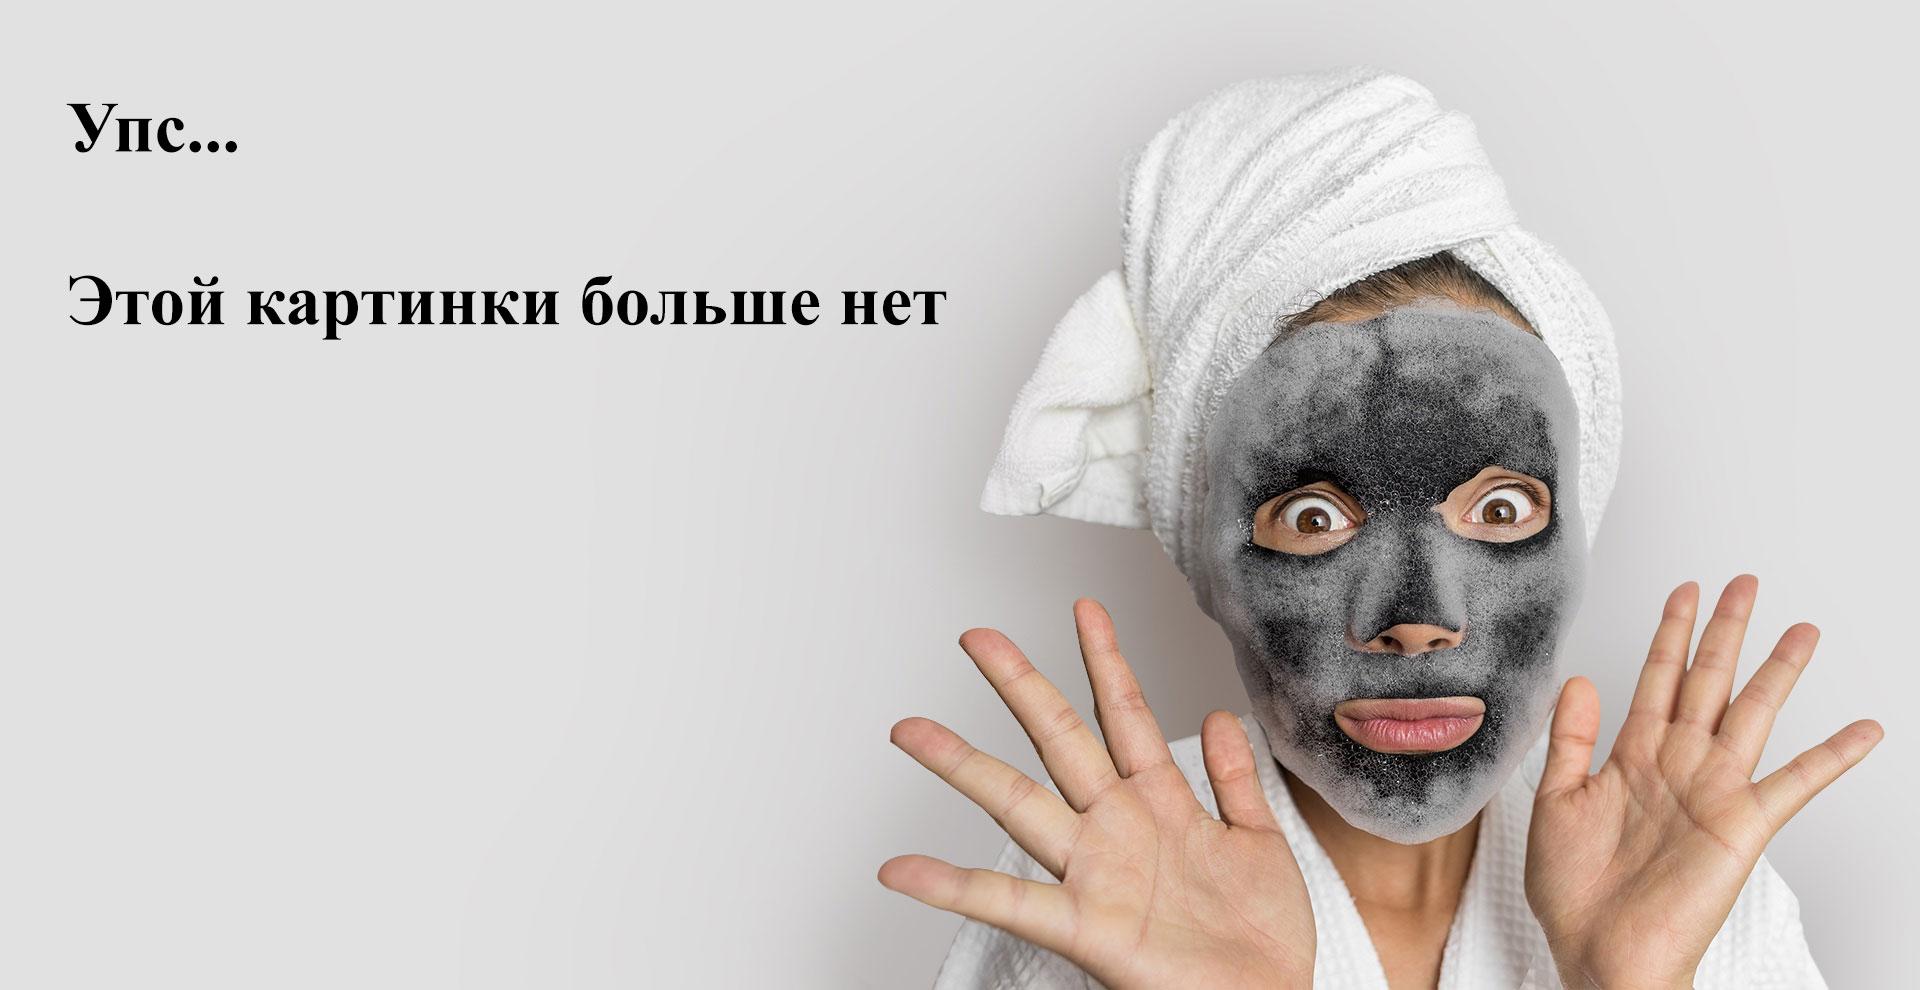 Holika Holika, Маска-мордочка против темных кругов под глазами, Панда